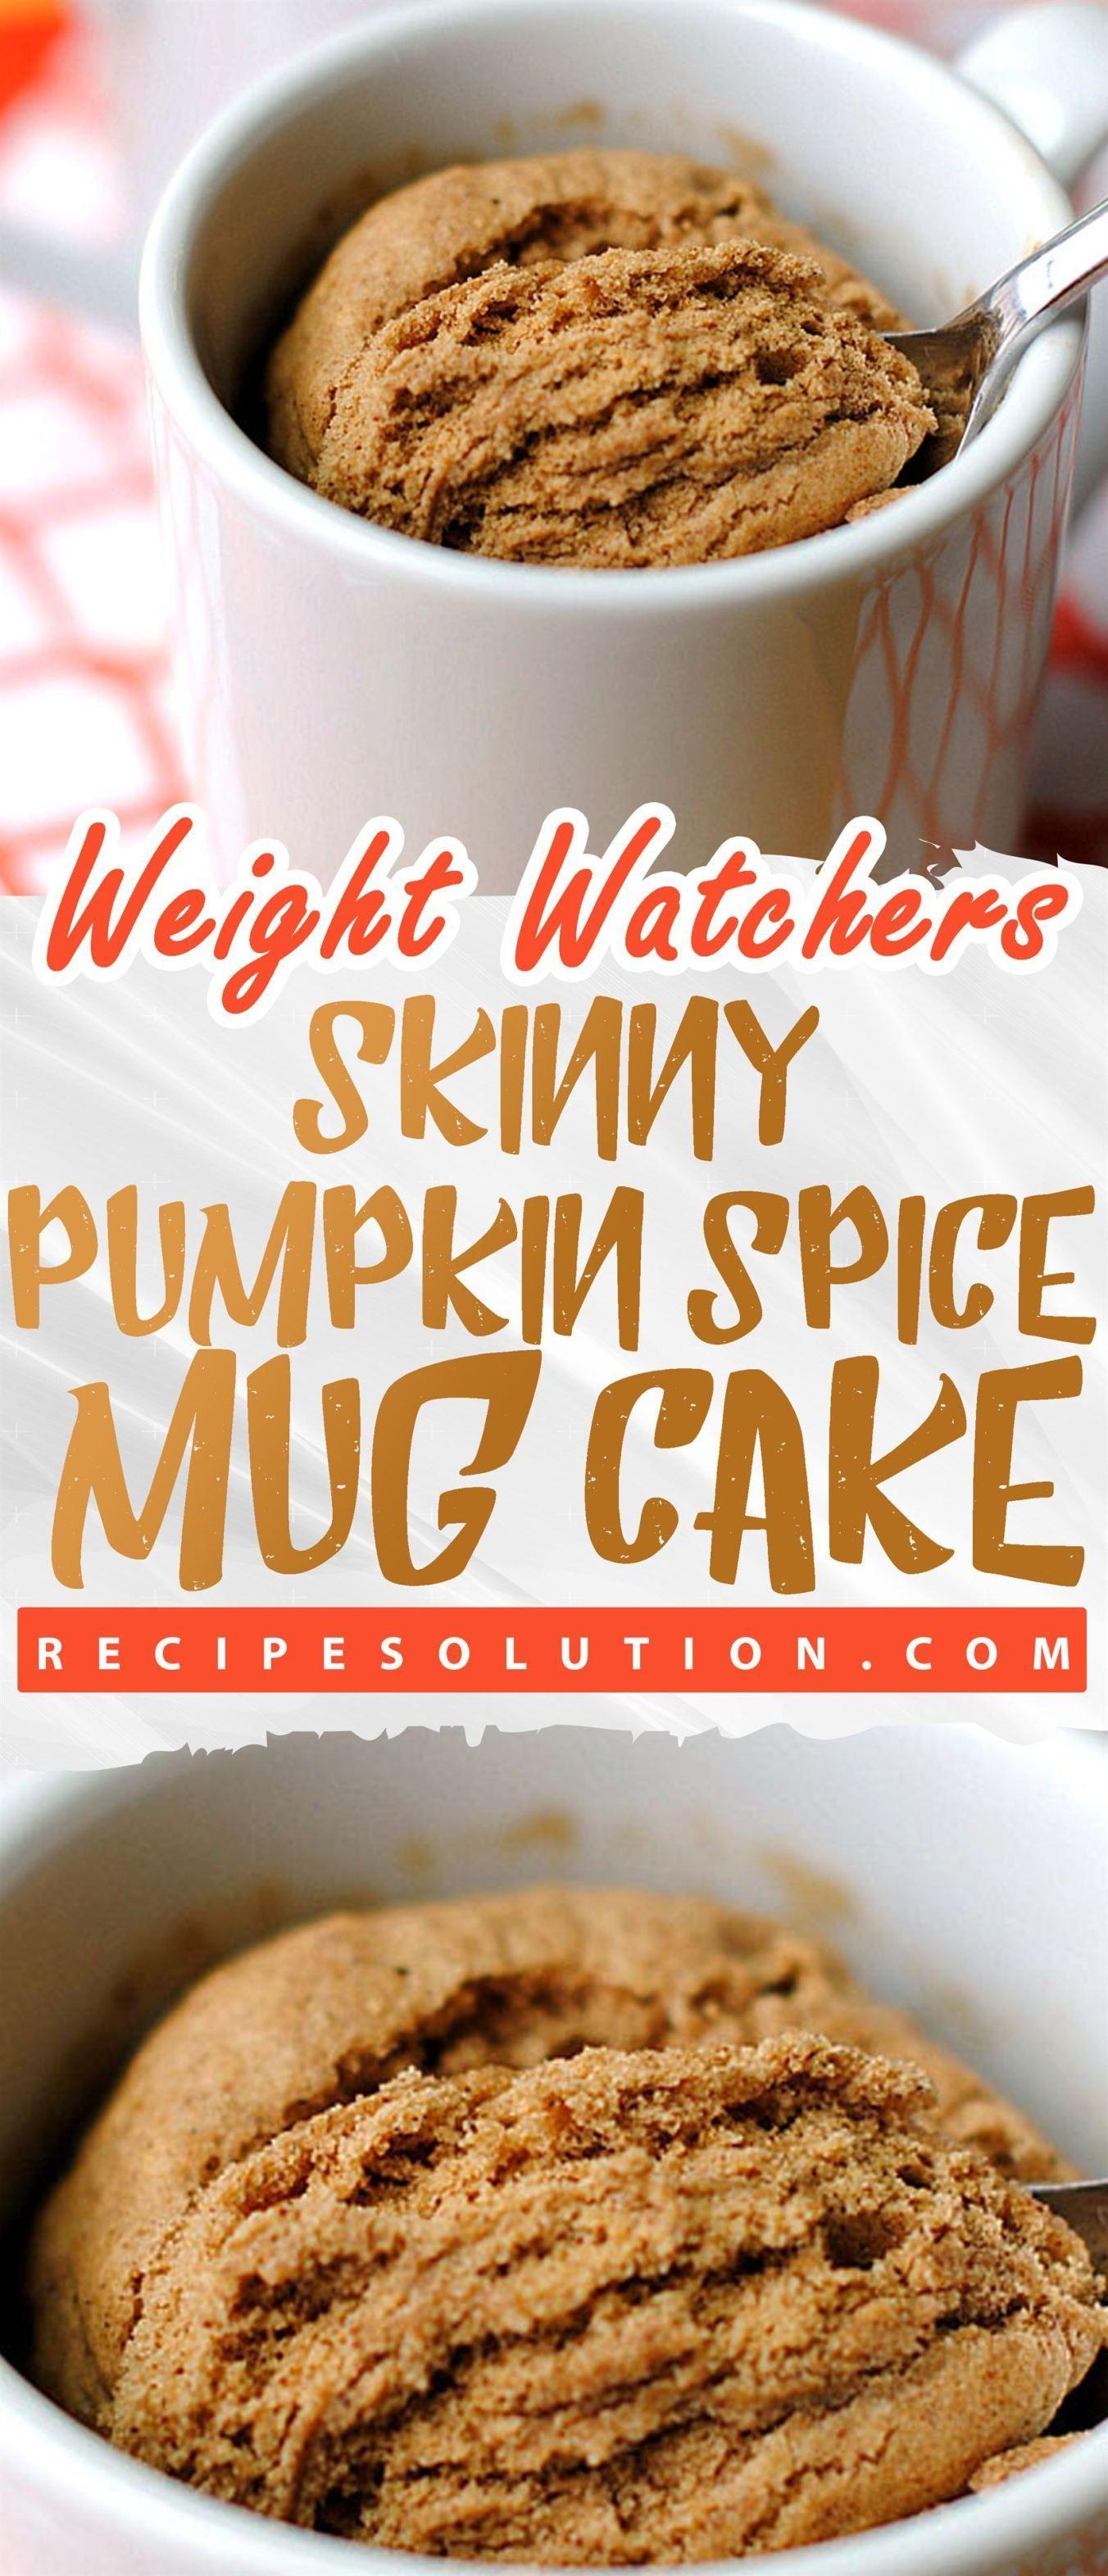 Skinny Pumpkin Spice Mug Cake | Skinny pumpkin, Weight ...